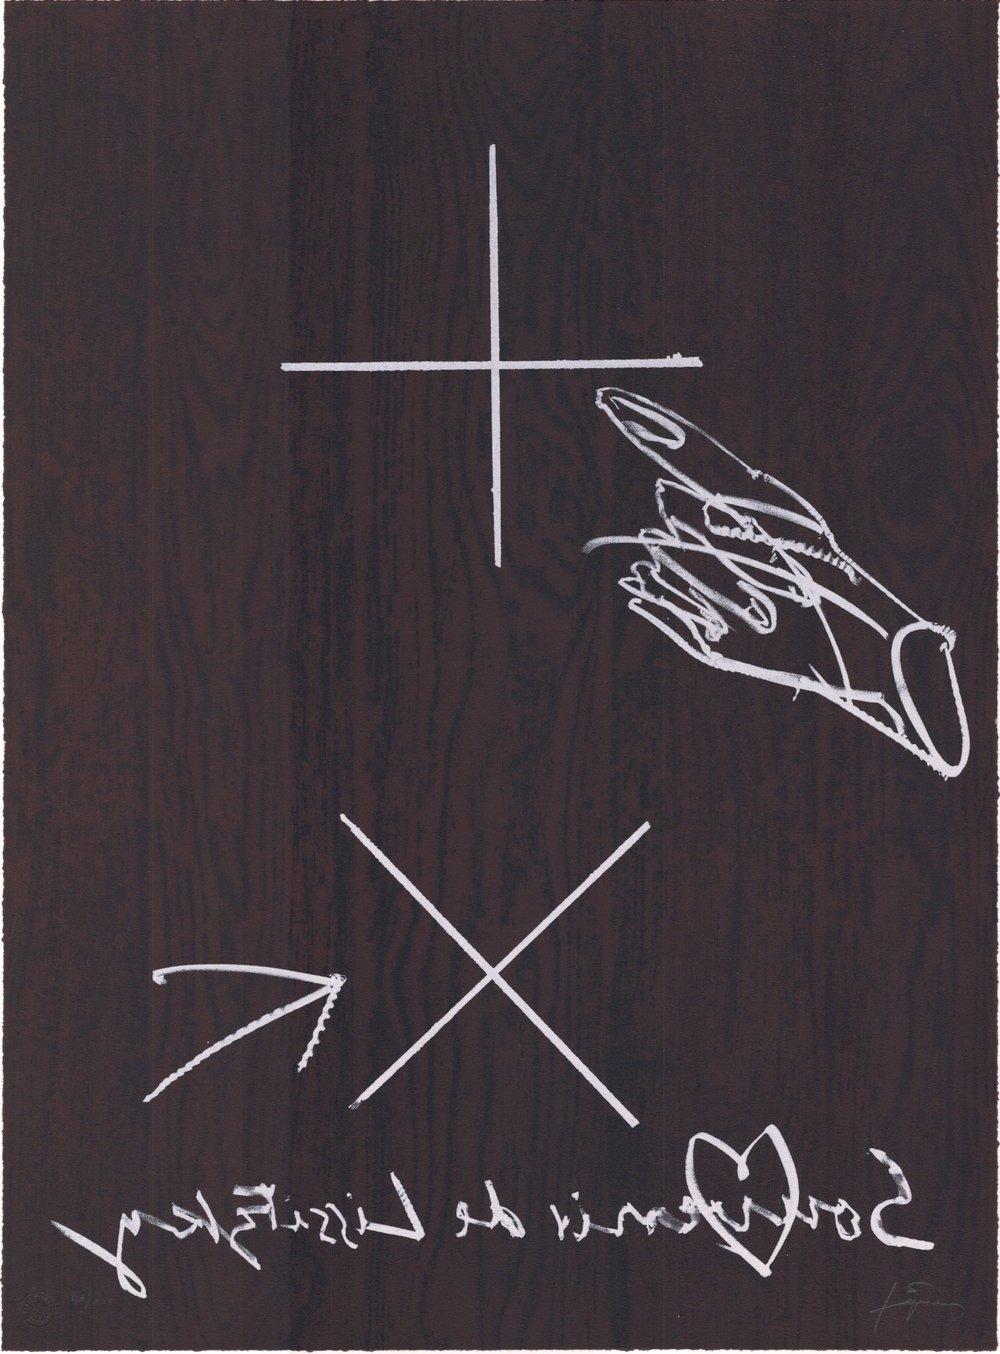 Souvenir de Lissitzky